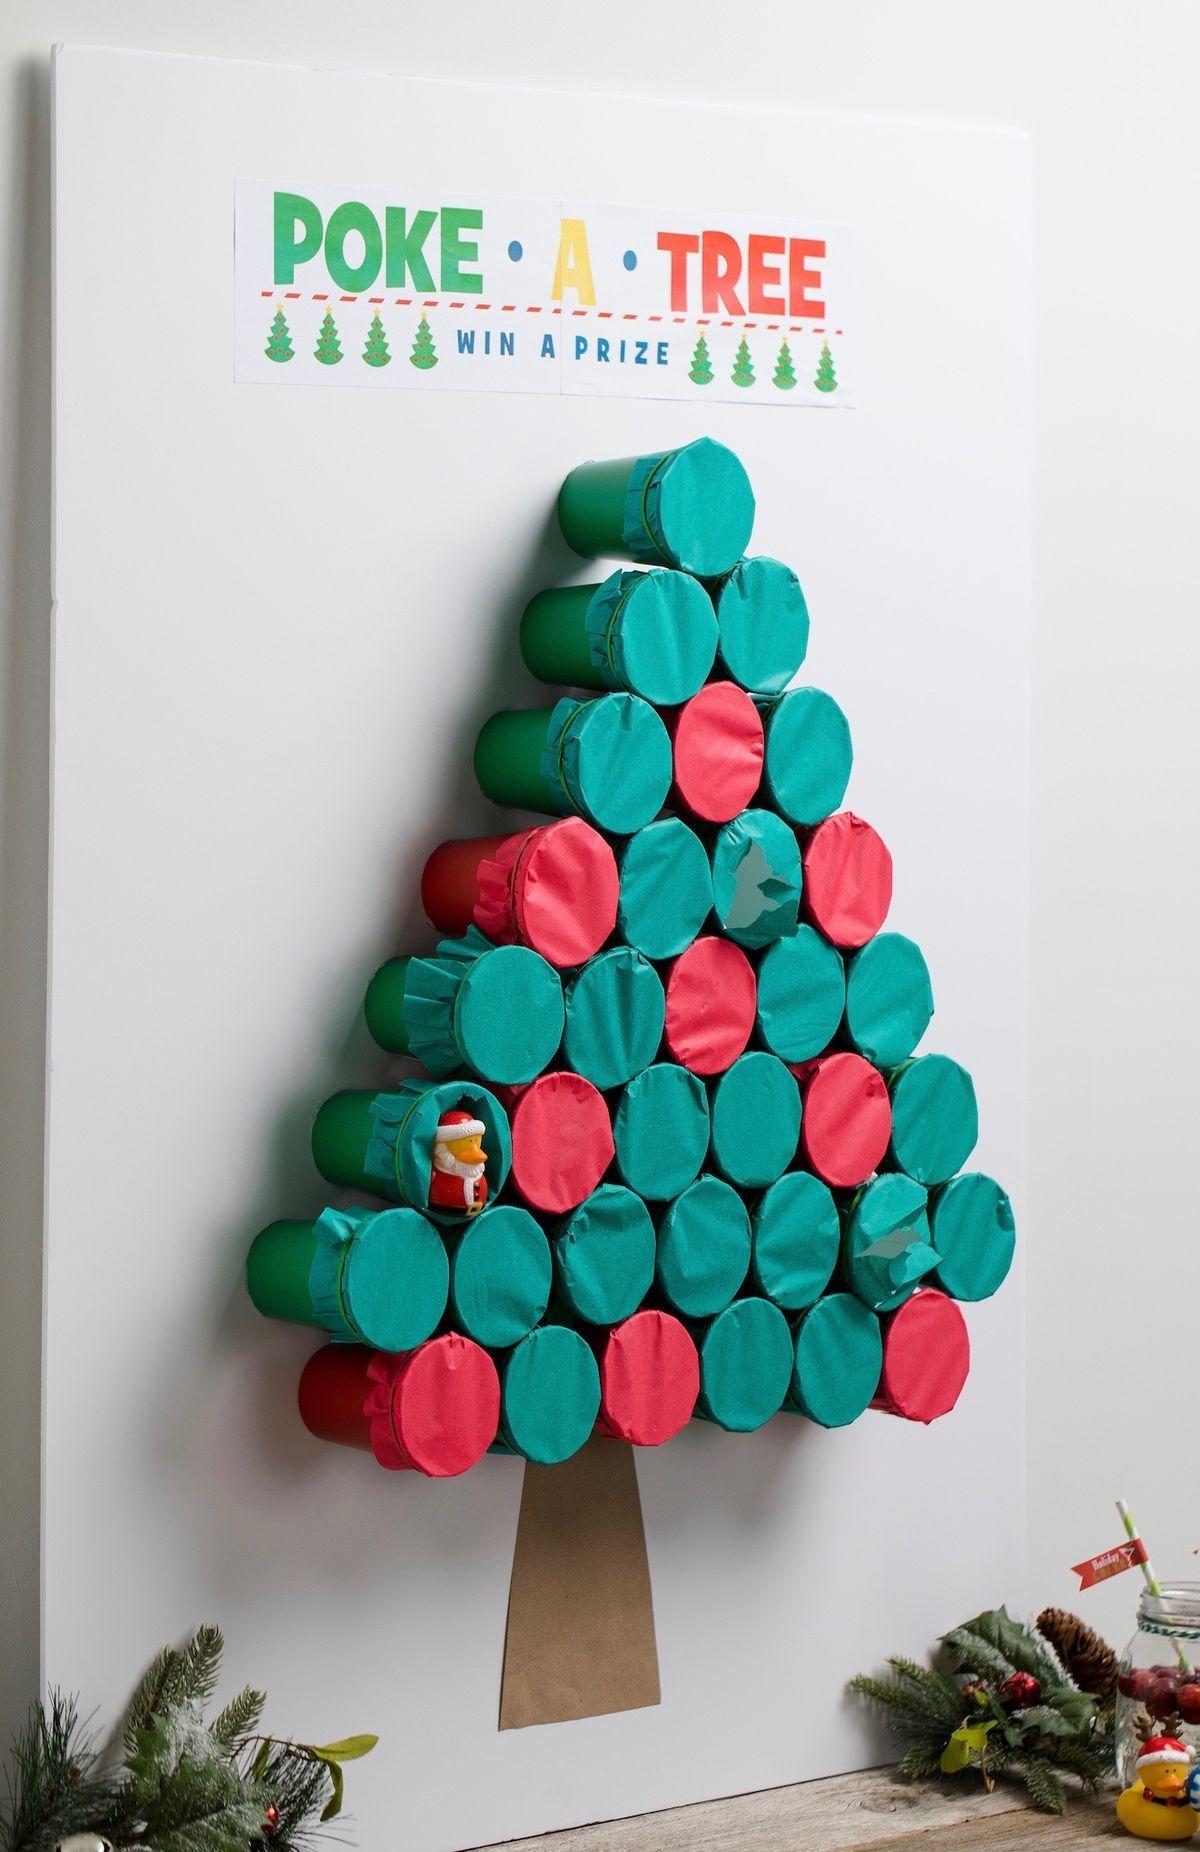 Poke A Tree Game Idea Christmas party ideas Pinterest